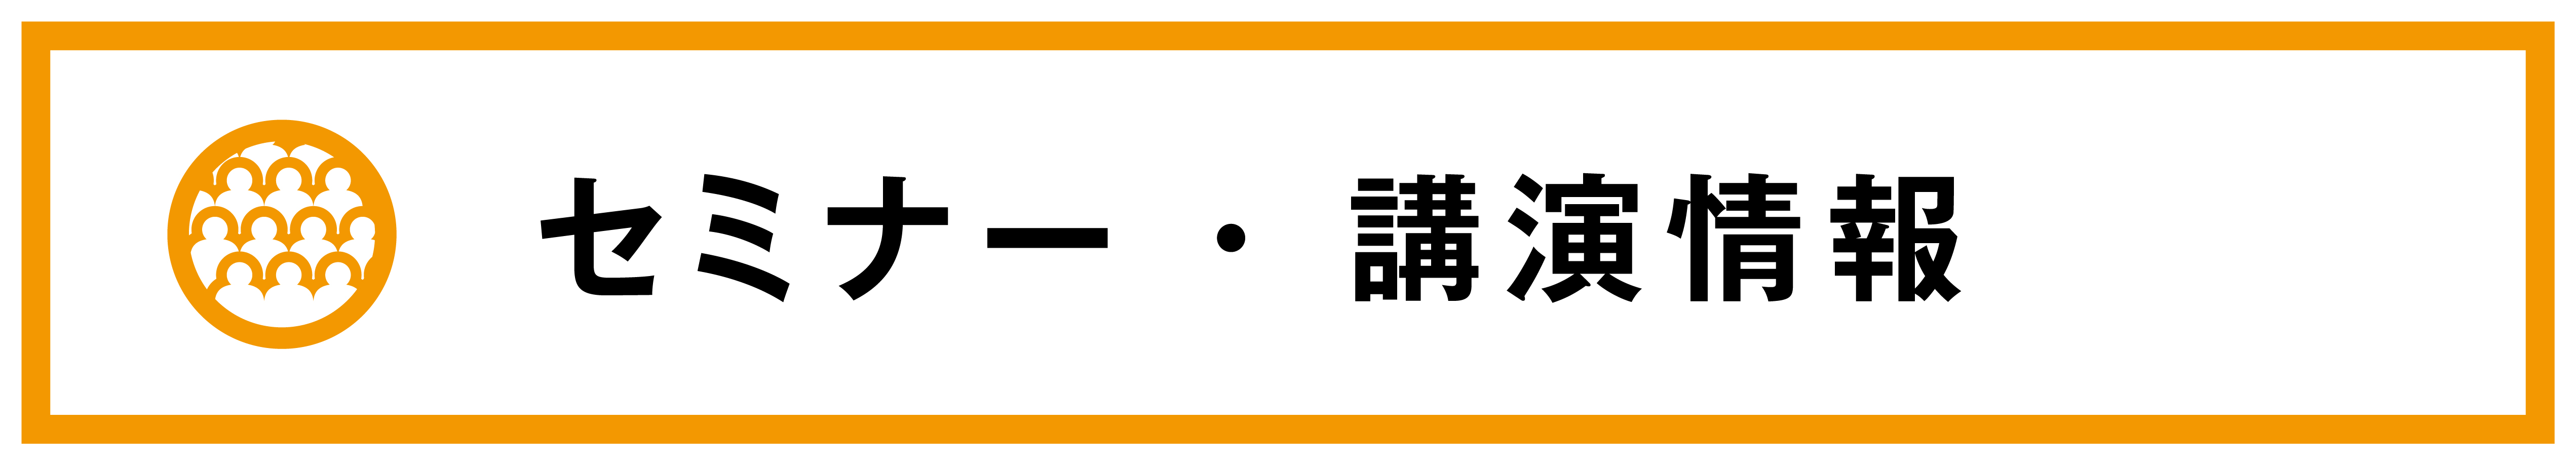 _blog_ハ?ナー 2-08.jpg